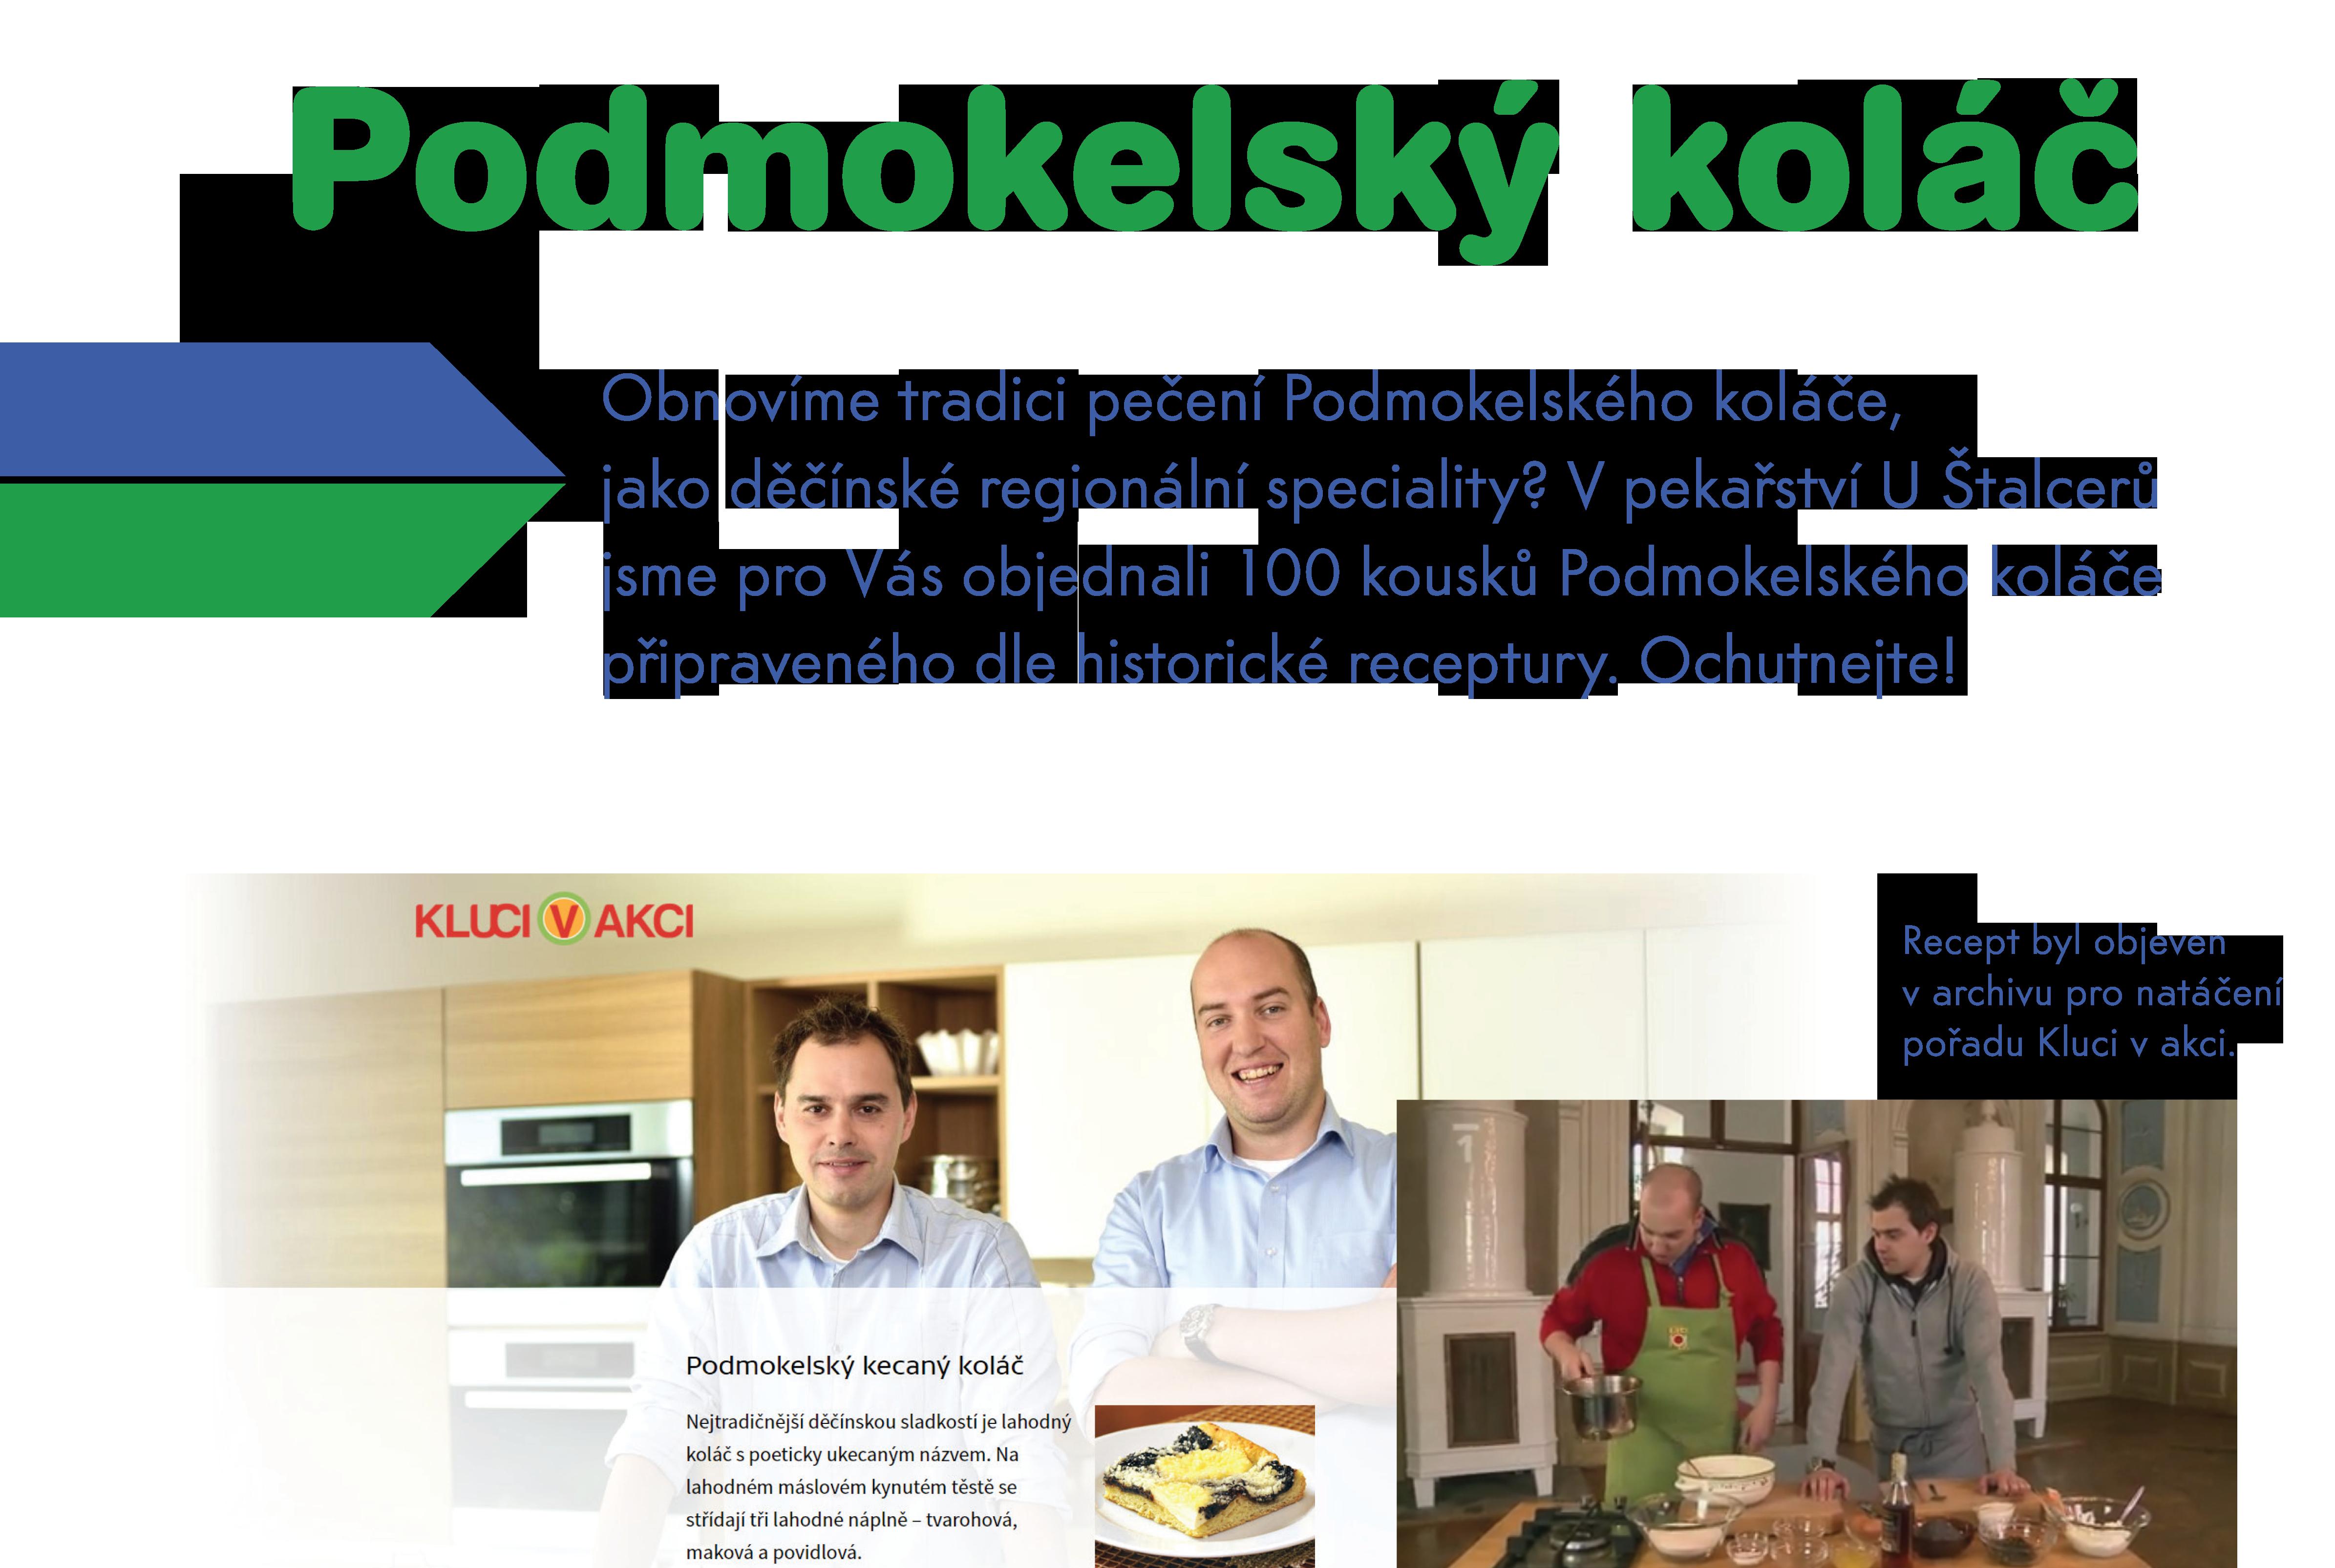 podmokelsky-kolac_krajska-debata